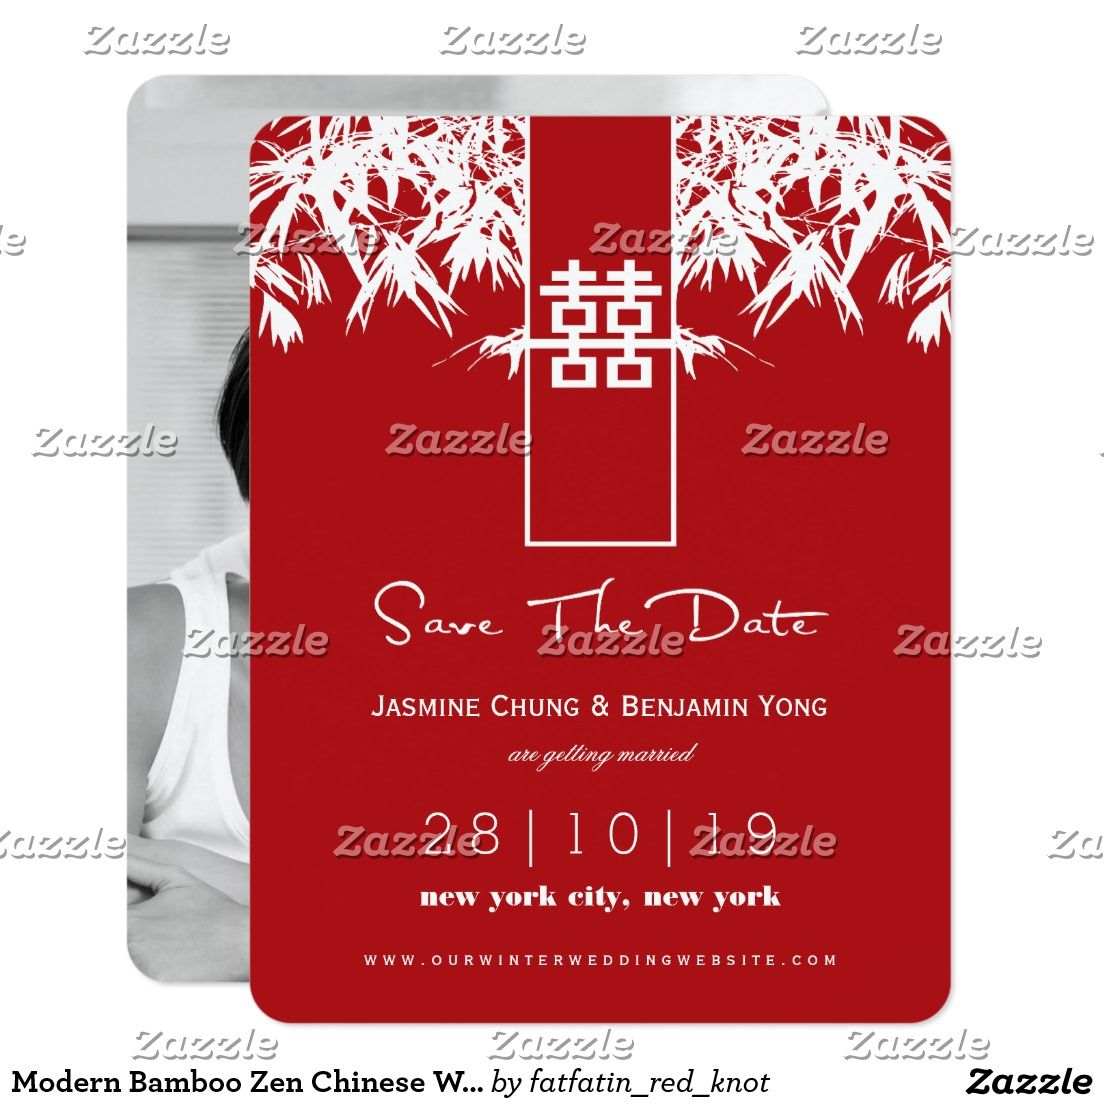 Modern Bamboo Zen Chinese Wedding Save The Date Card | Zen chinese ...